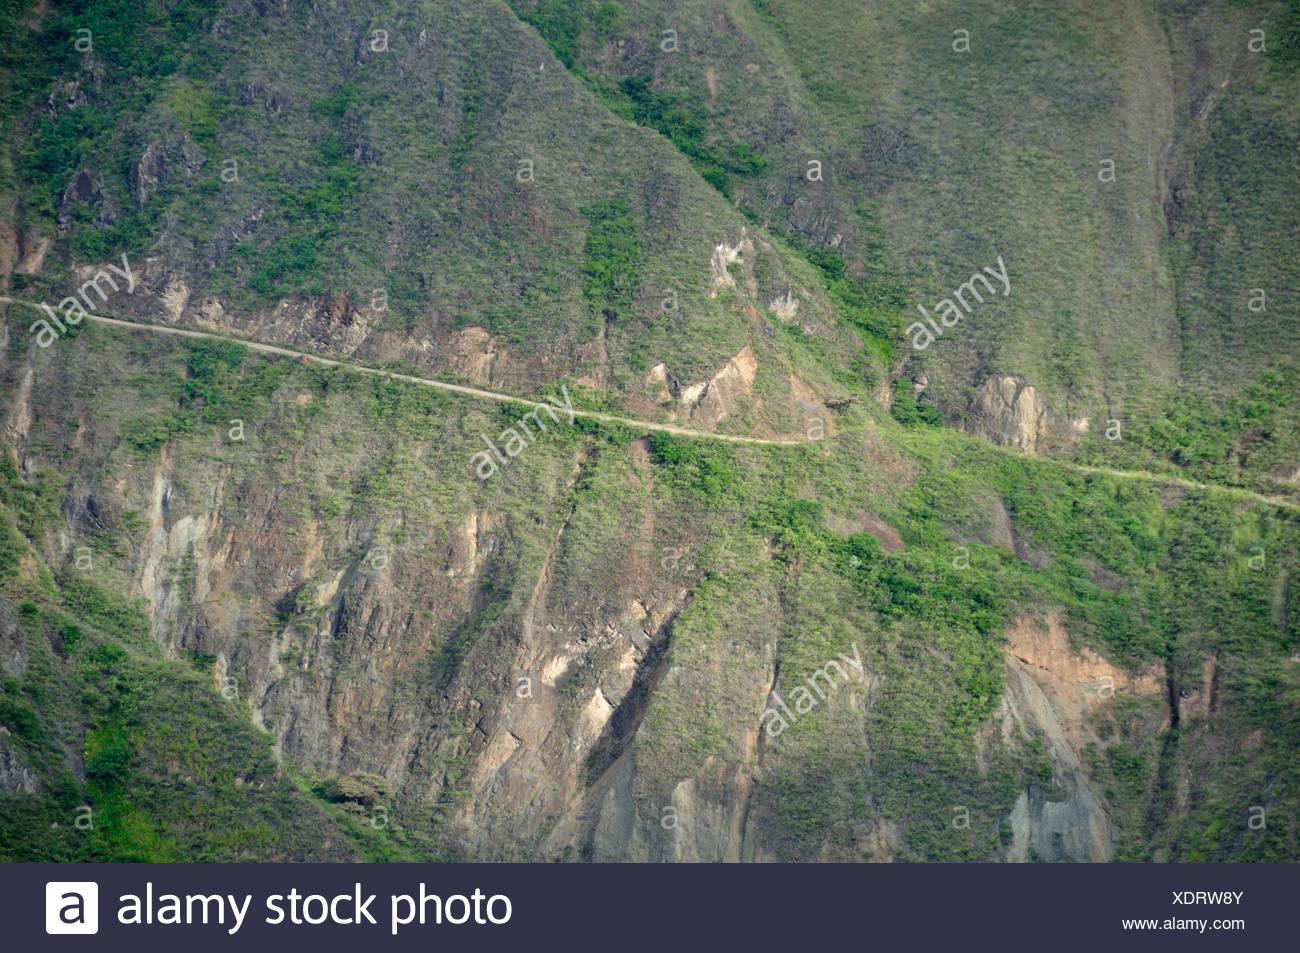 Straße, üppigen, Fernbedienung, Anden, Berge, Canyons, Pasto, Anden Berge, Kolumbien, Südamerika Stockbild